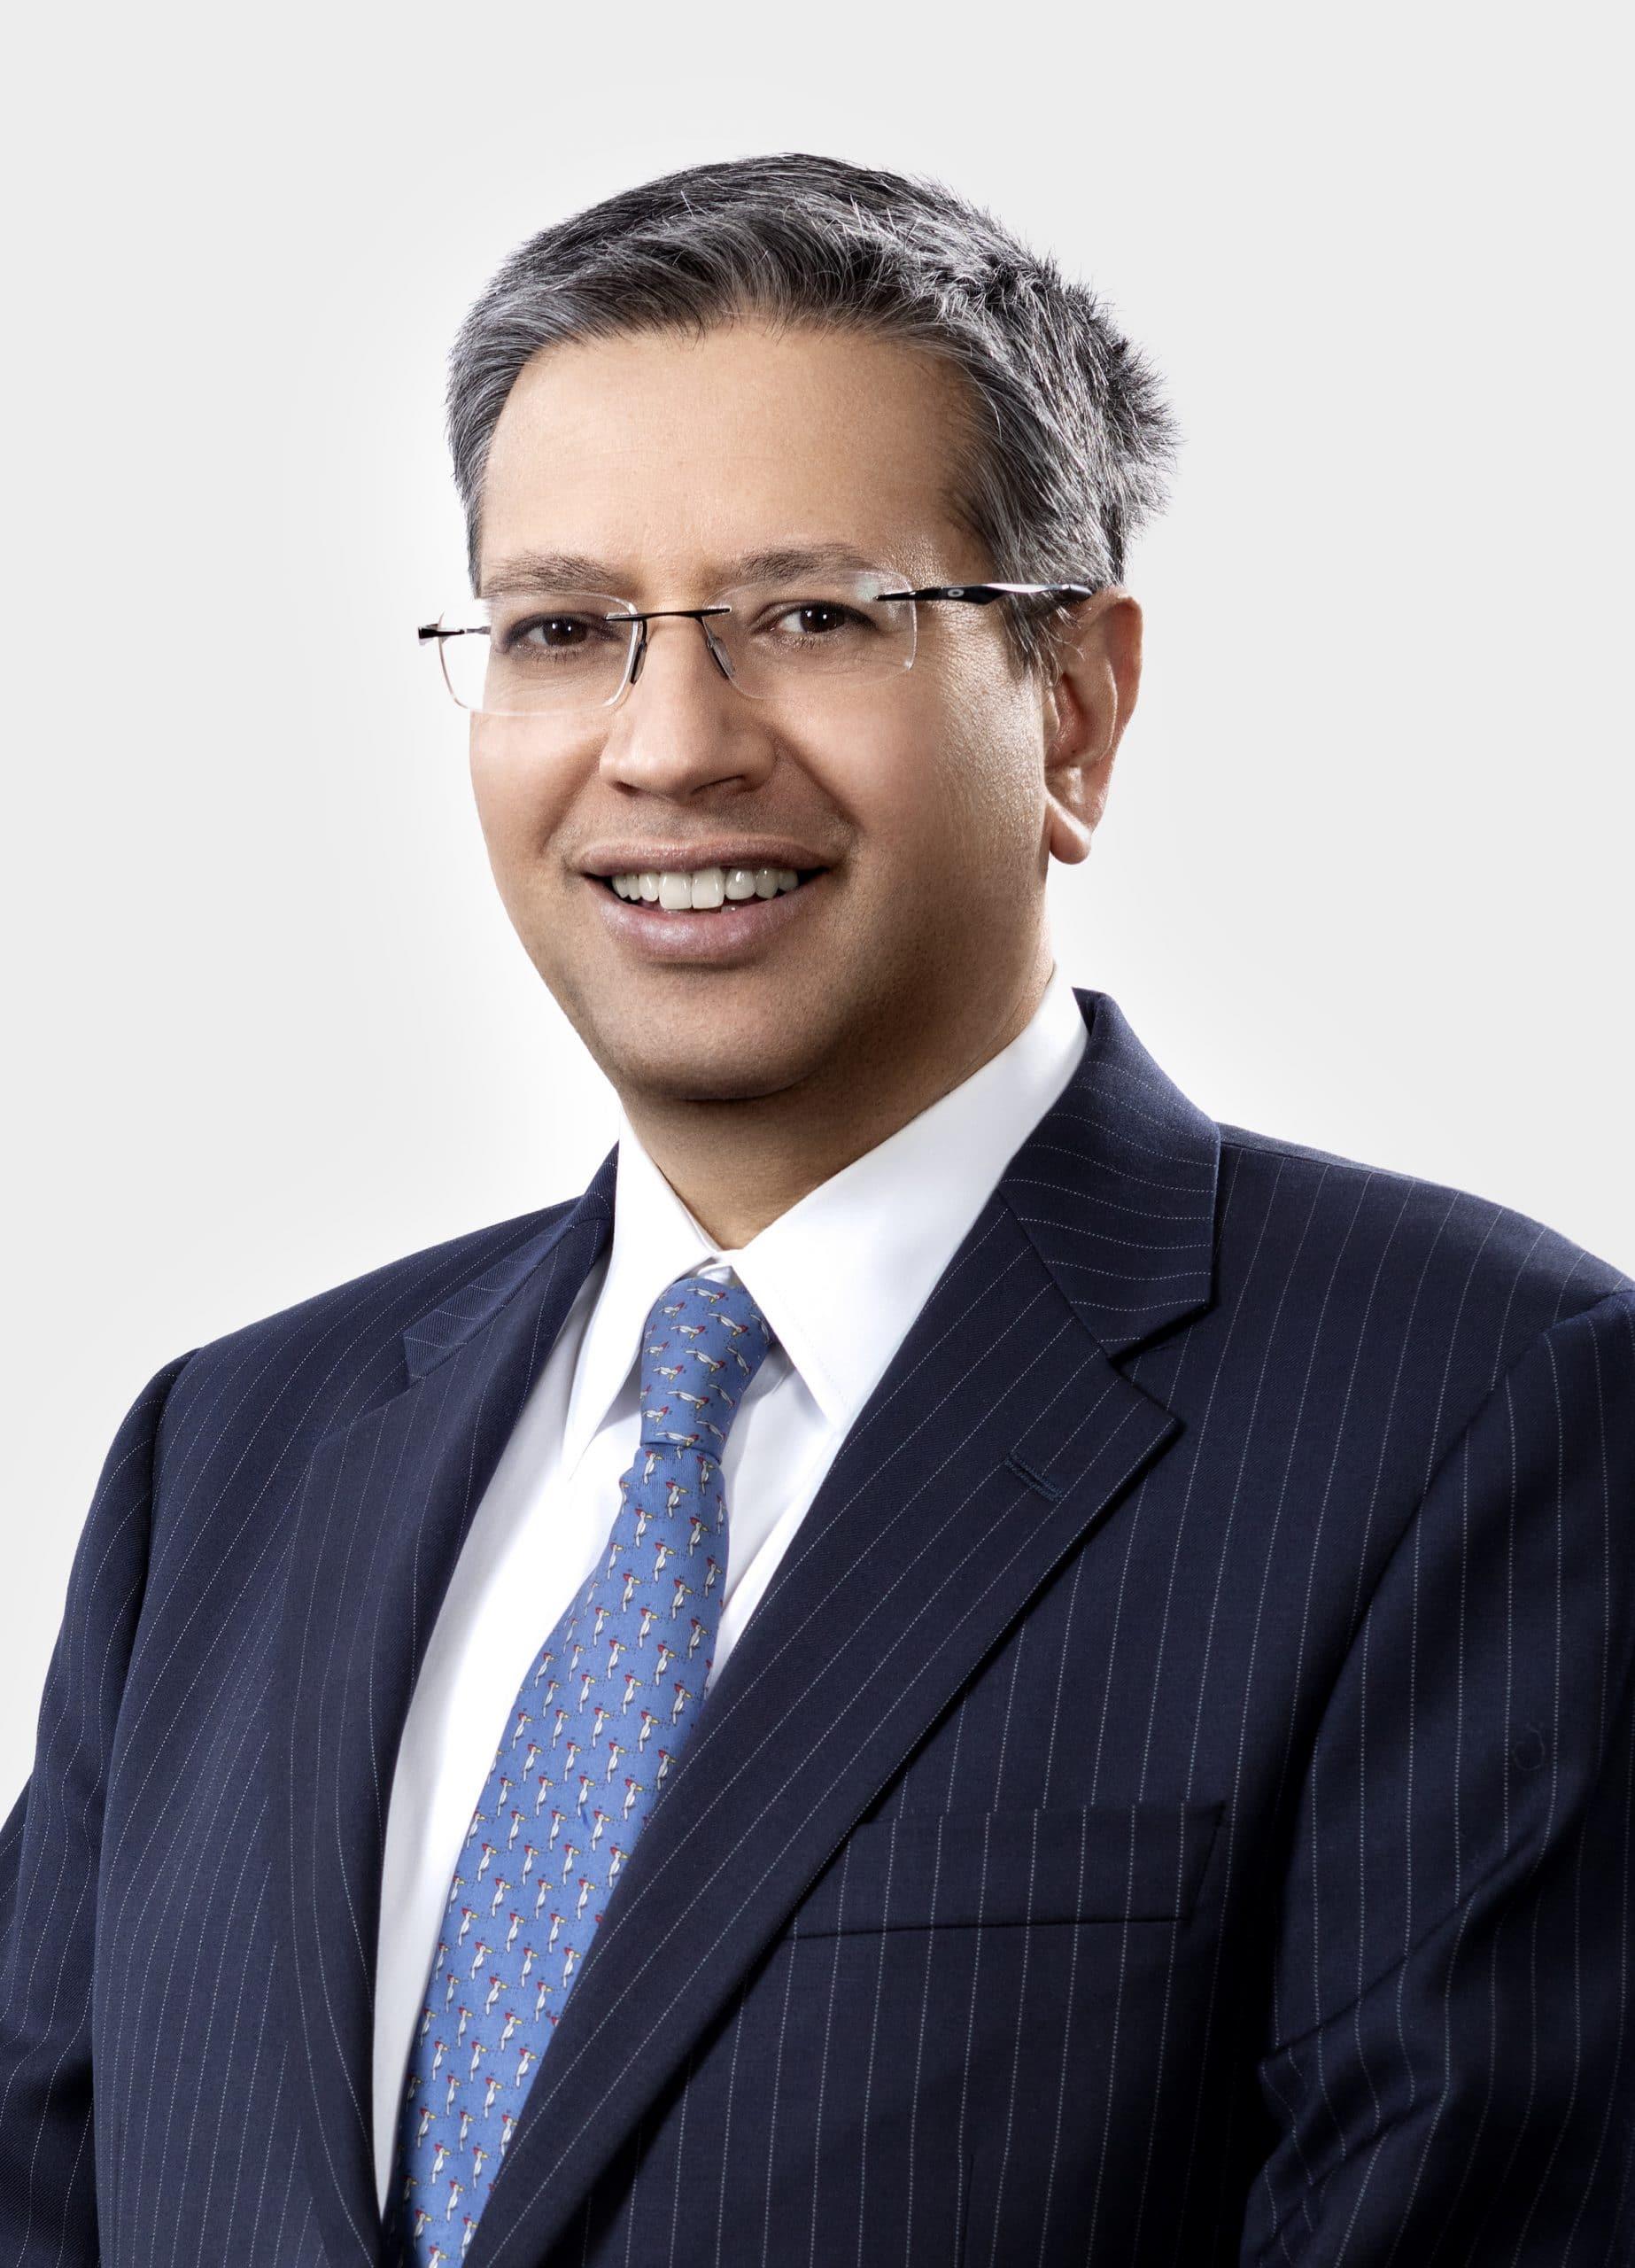 Rohit Verma, Board of Directors, Claim Genius